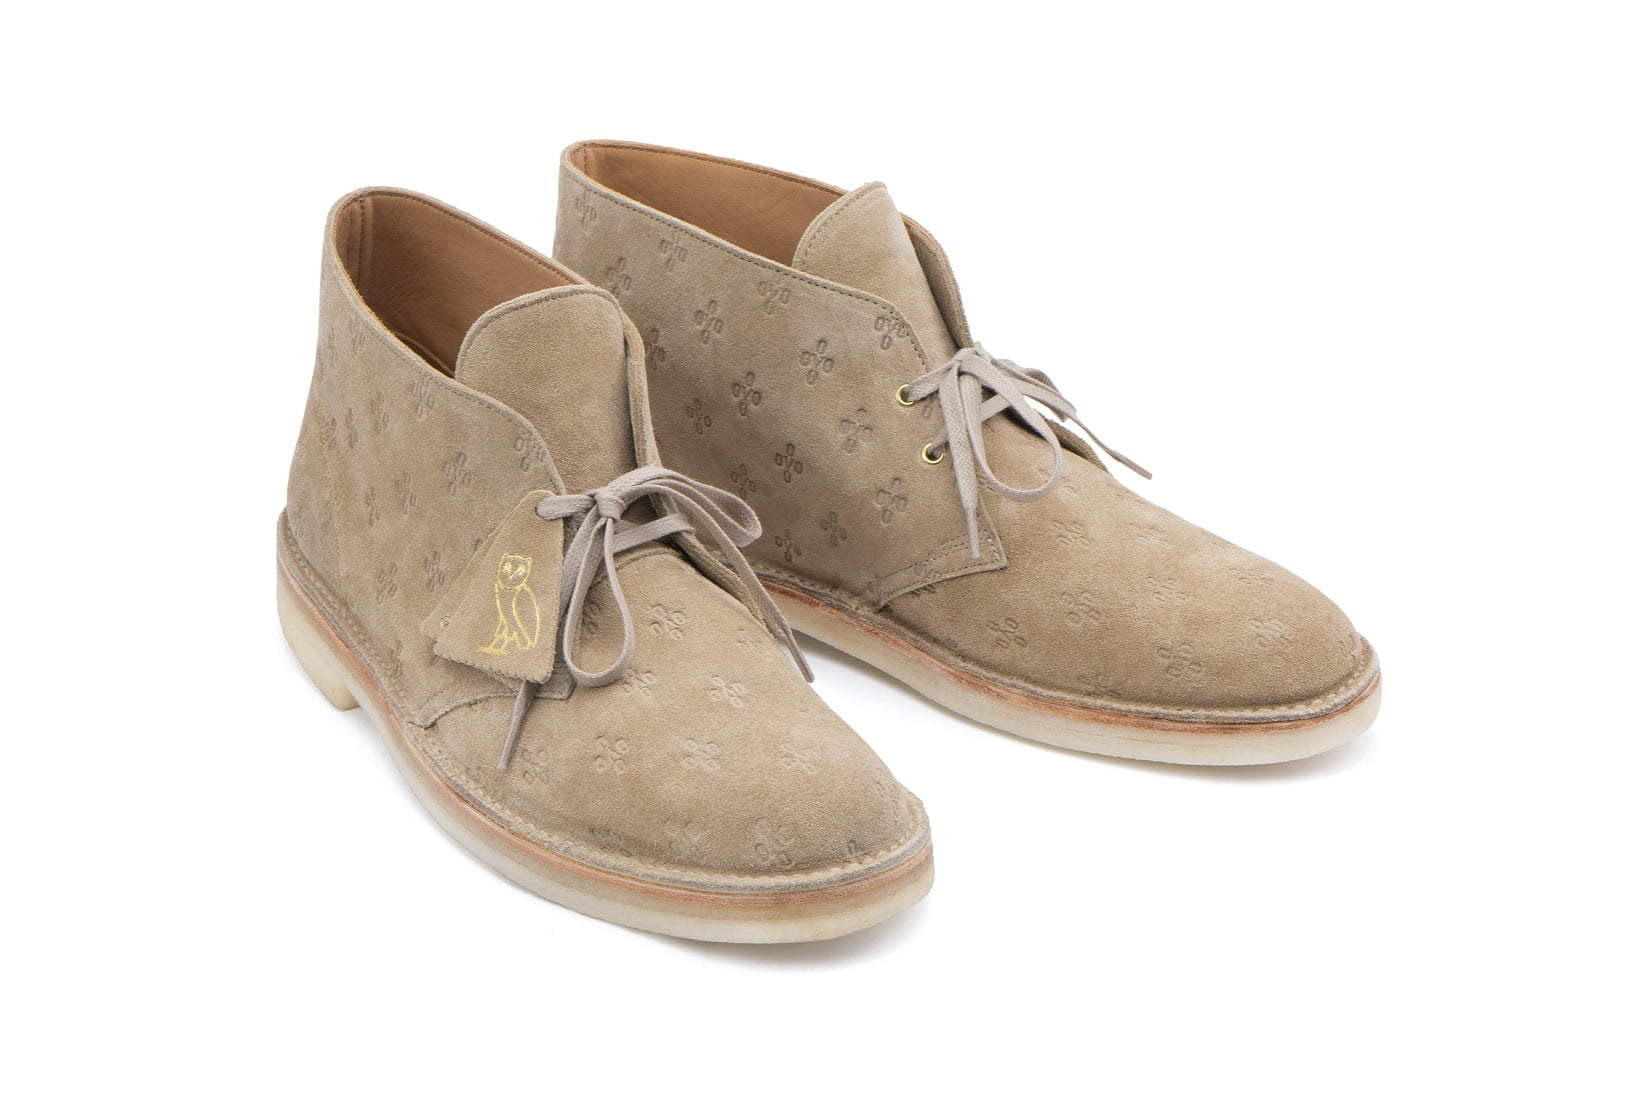 Drake Shoes Clarks